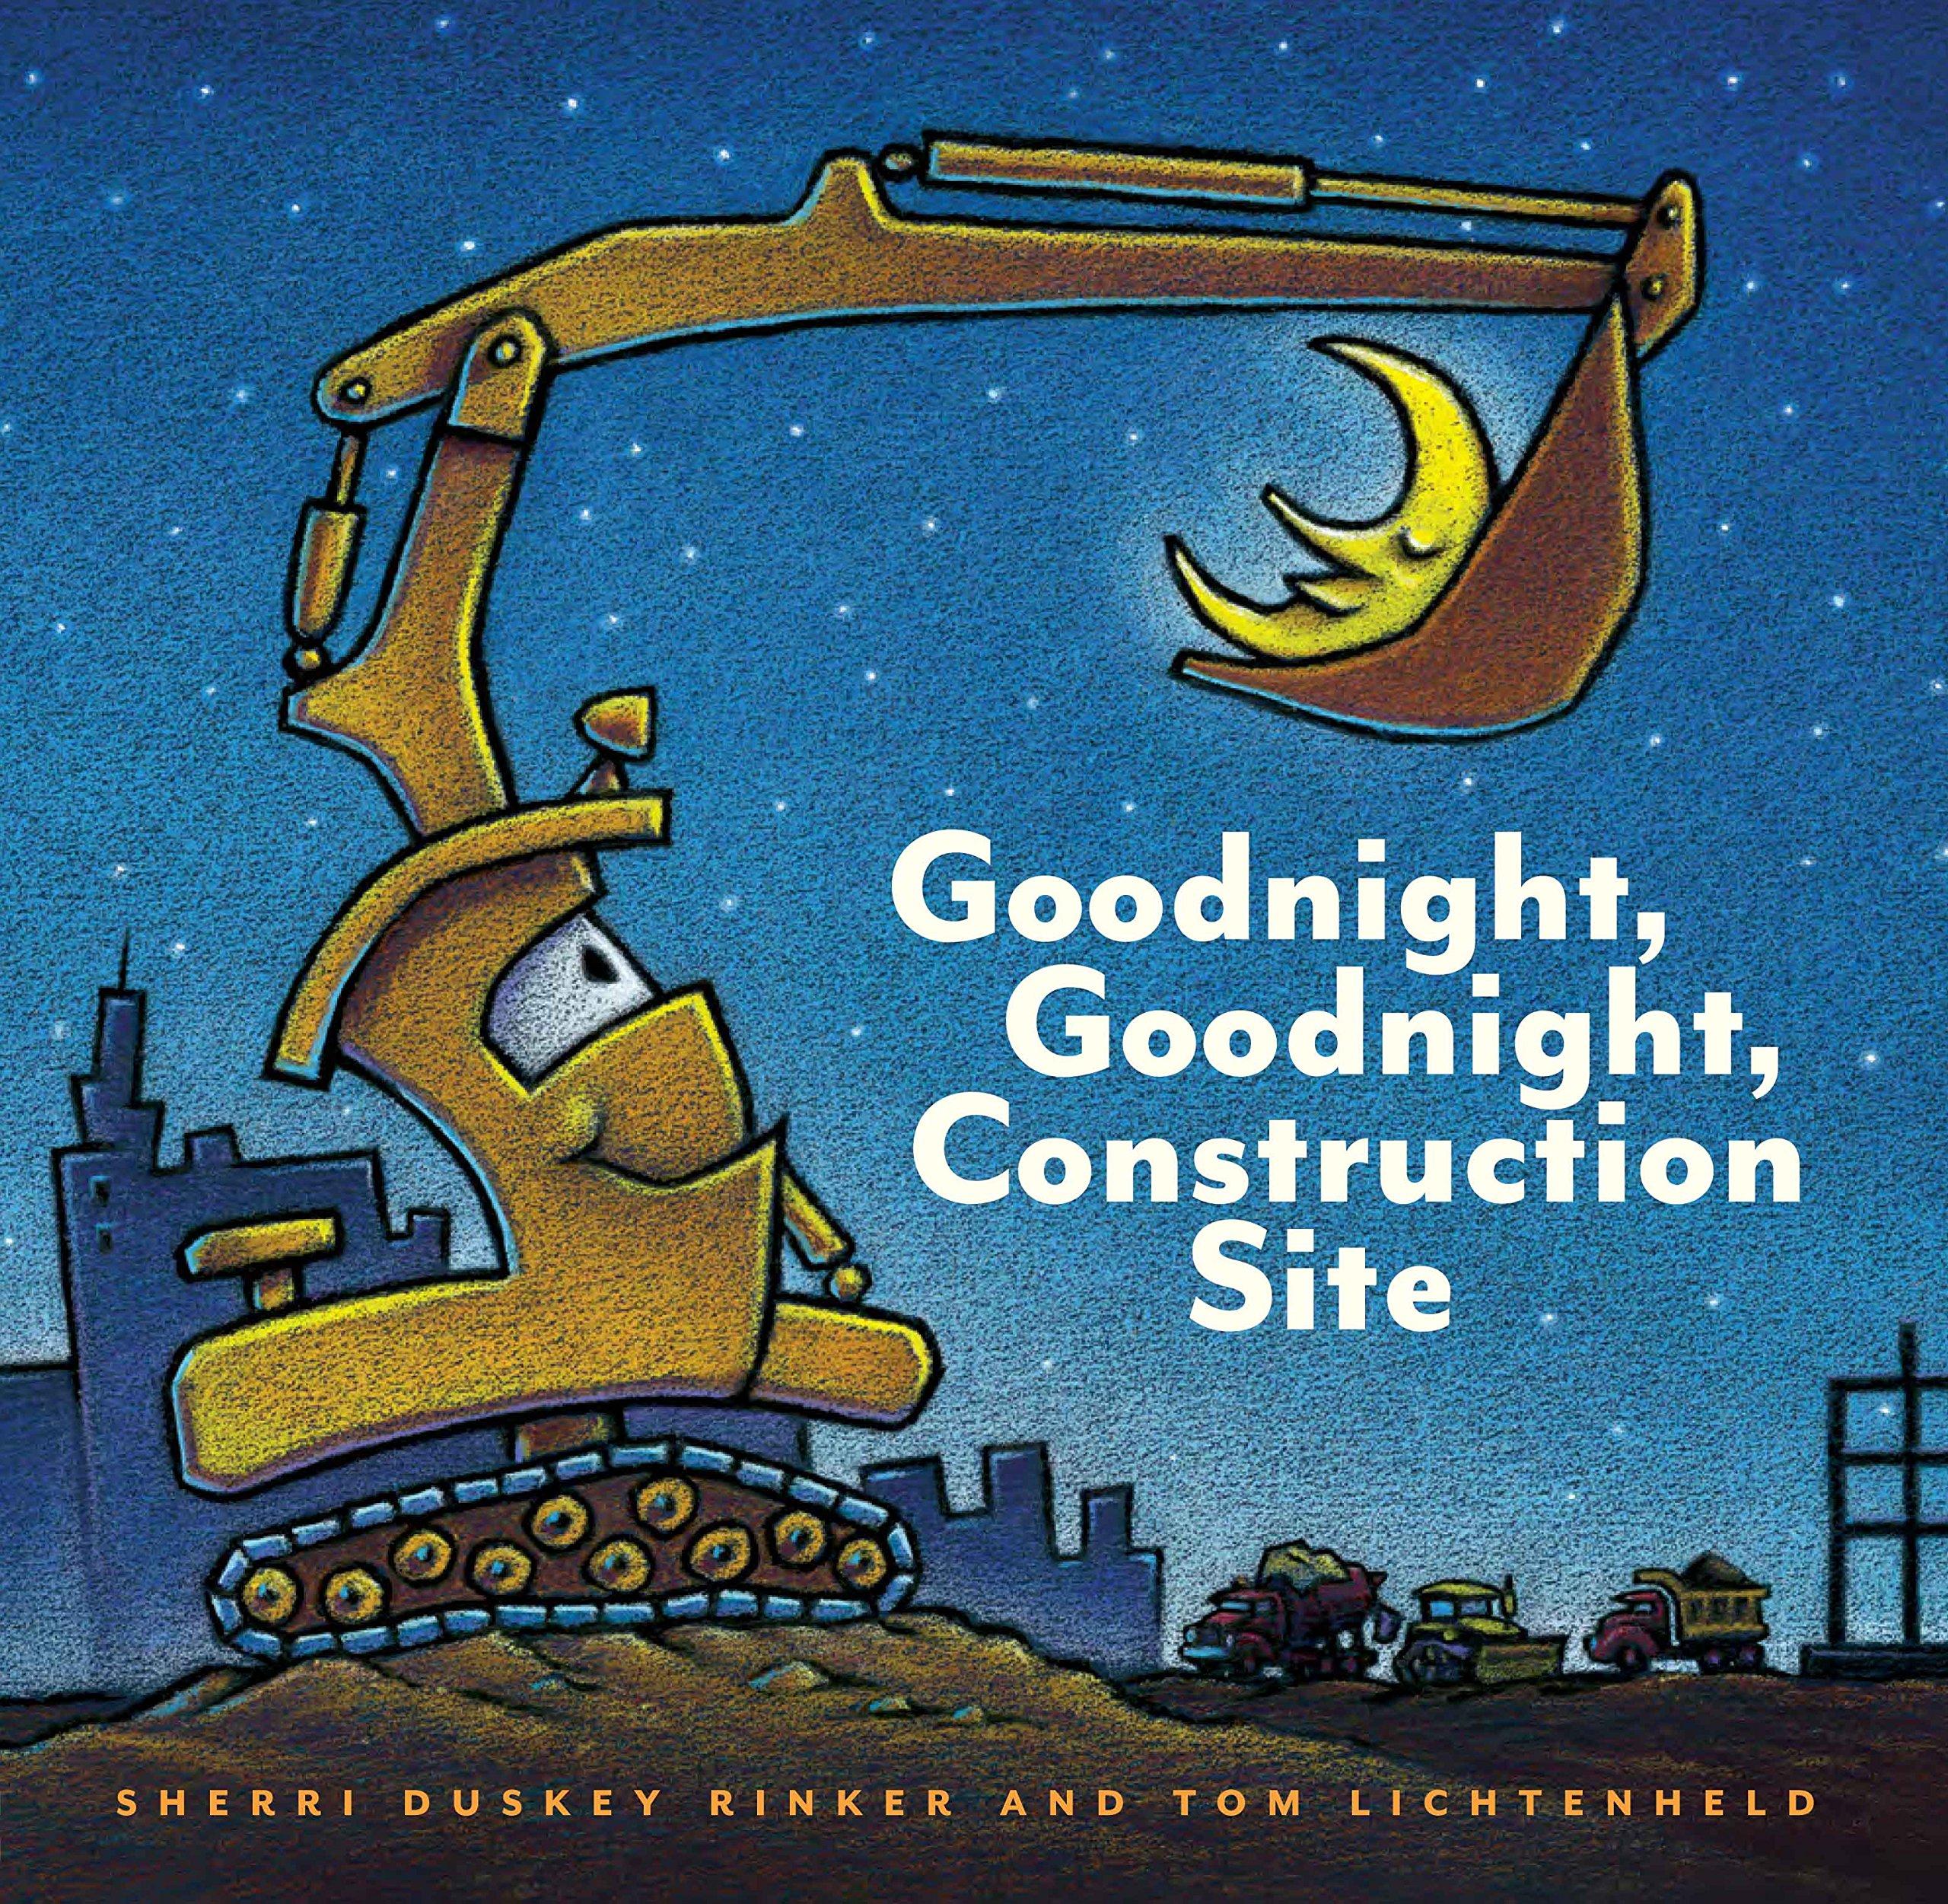 Goodnight Construction Site